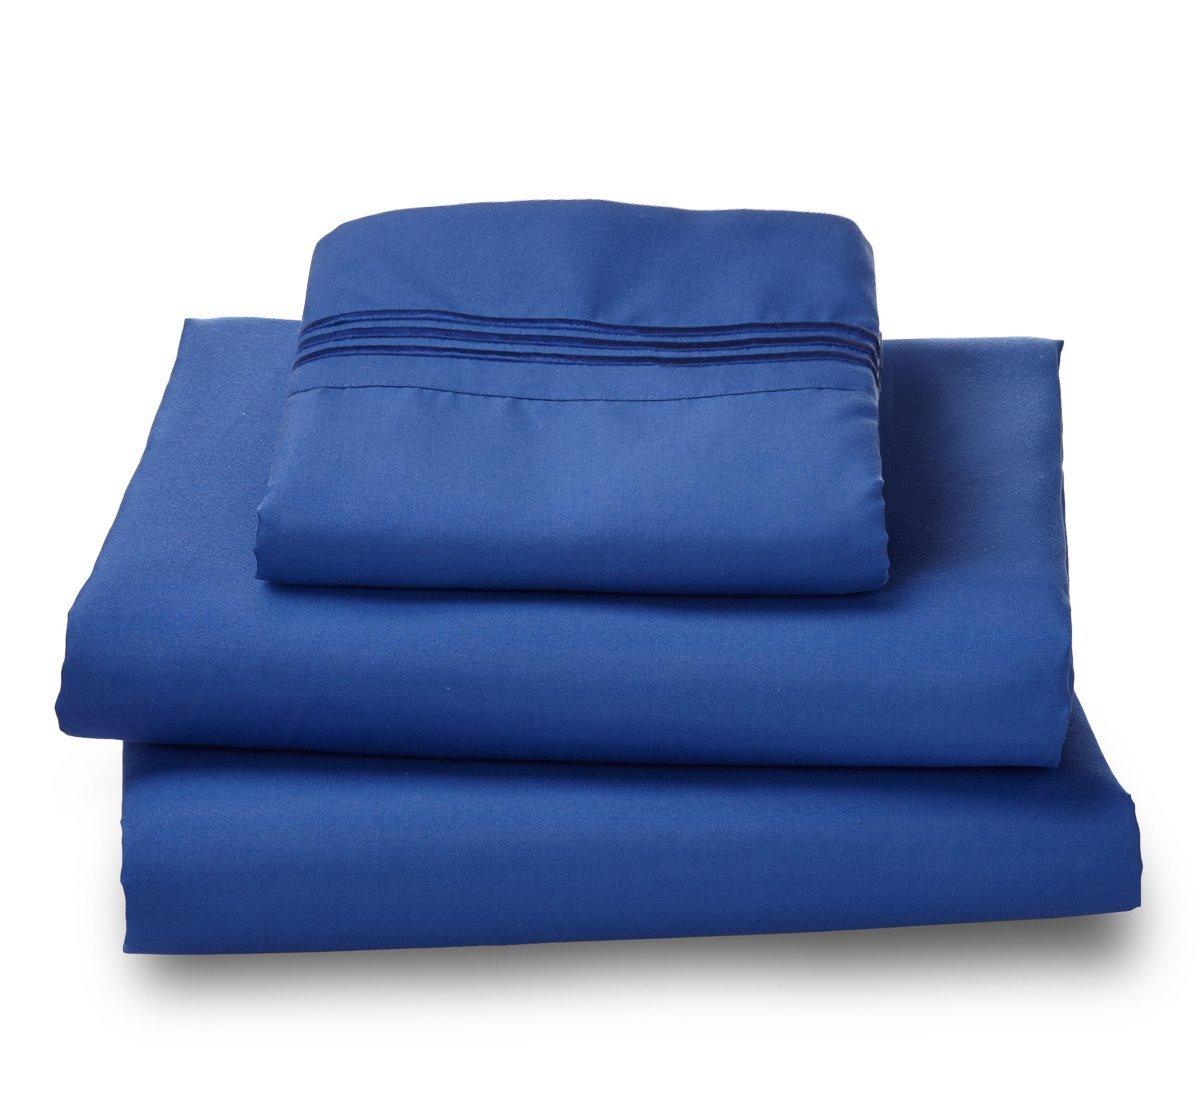 Where the Polka Dots Roam 100% Ultra Soft Microfiber Easy Care Luxury Sheet Set, Twin, Indigo Blue